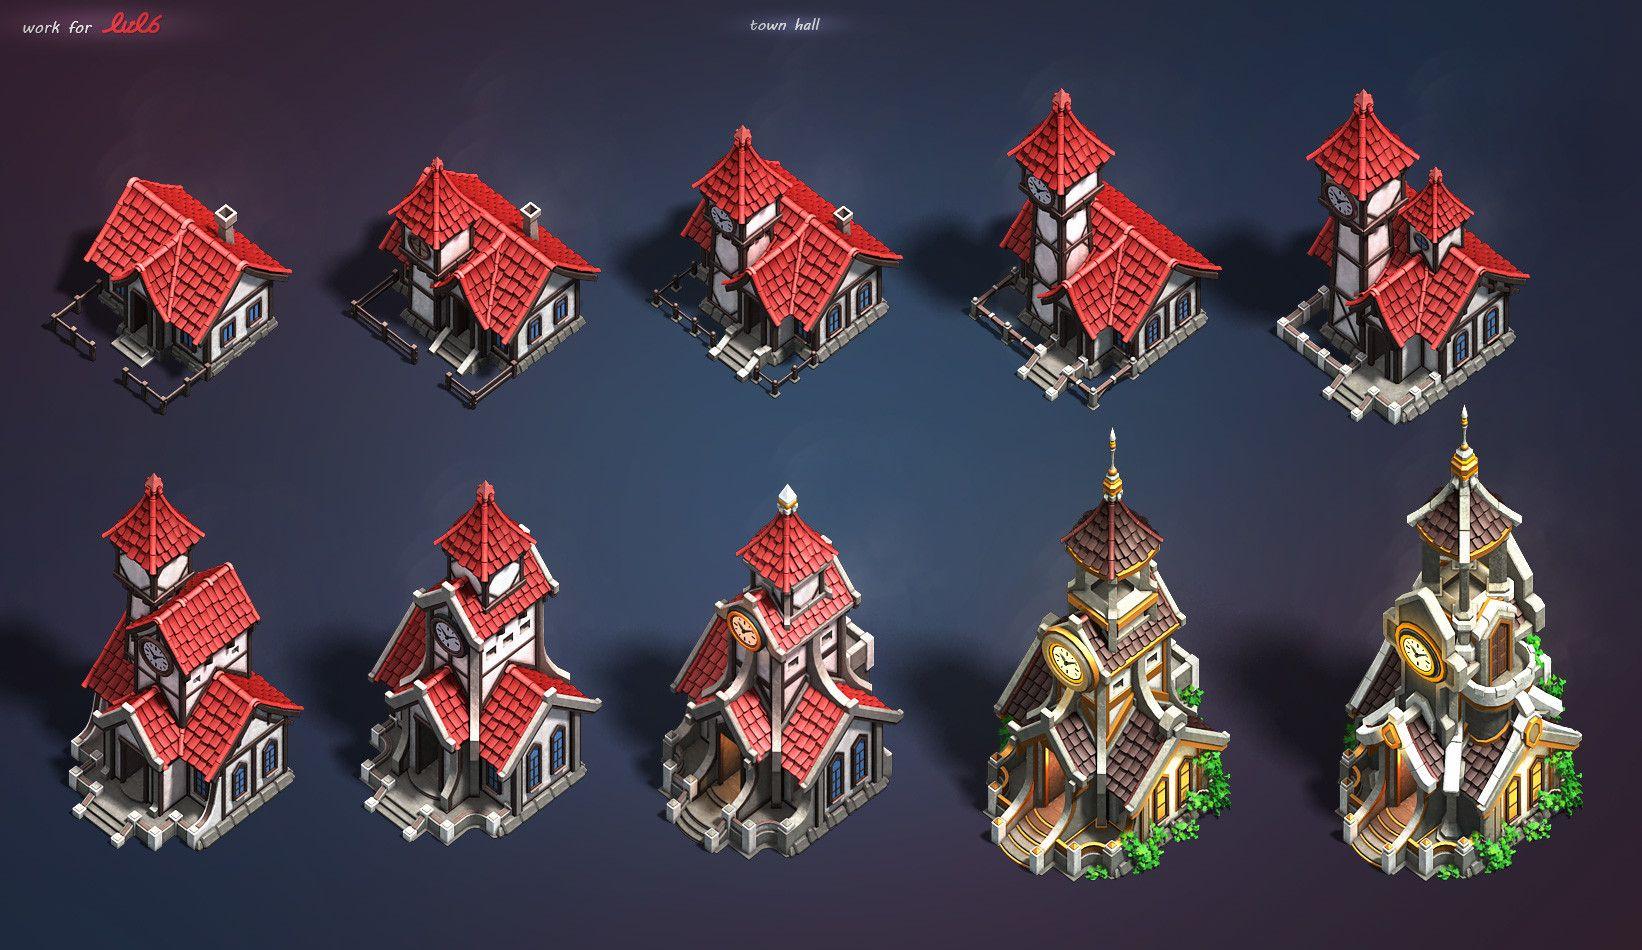 Town Hall Vladimir Voronov Buildings Artwork Isometric Art Town Hall